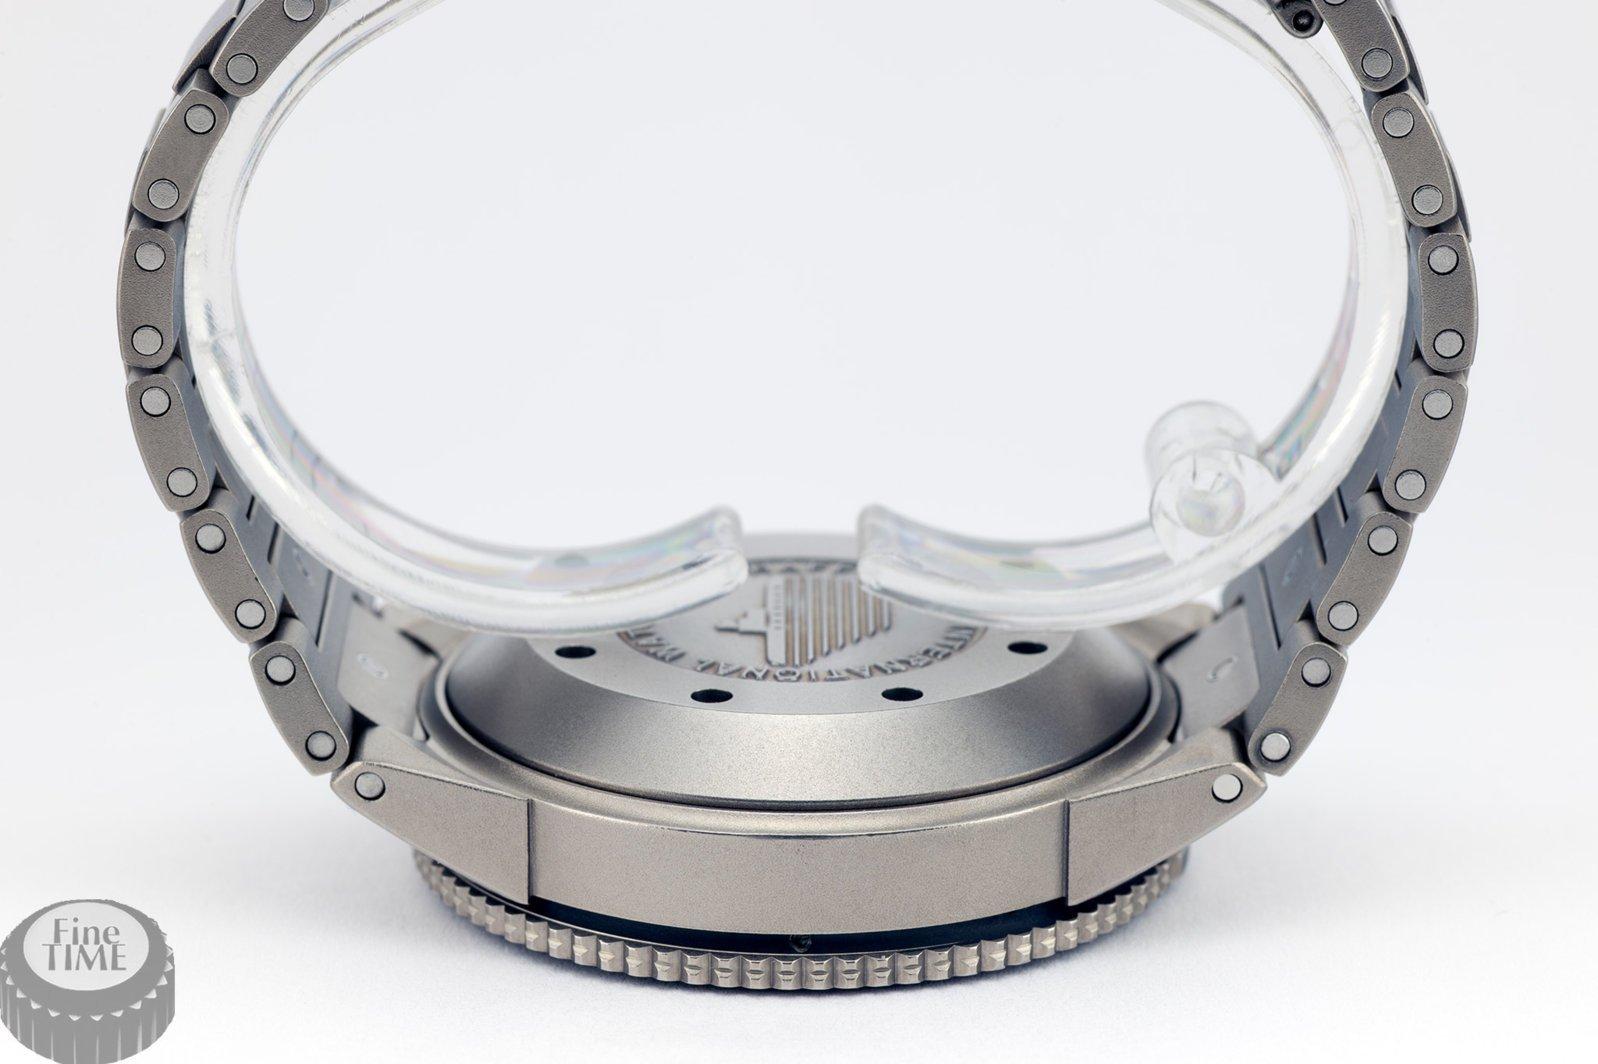 iwc-aquatimer-gst-iw3536-001-titanium-04.jpg